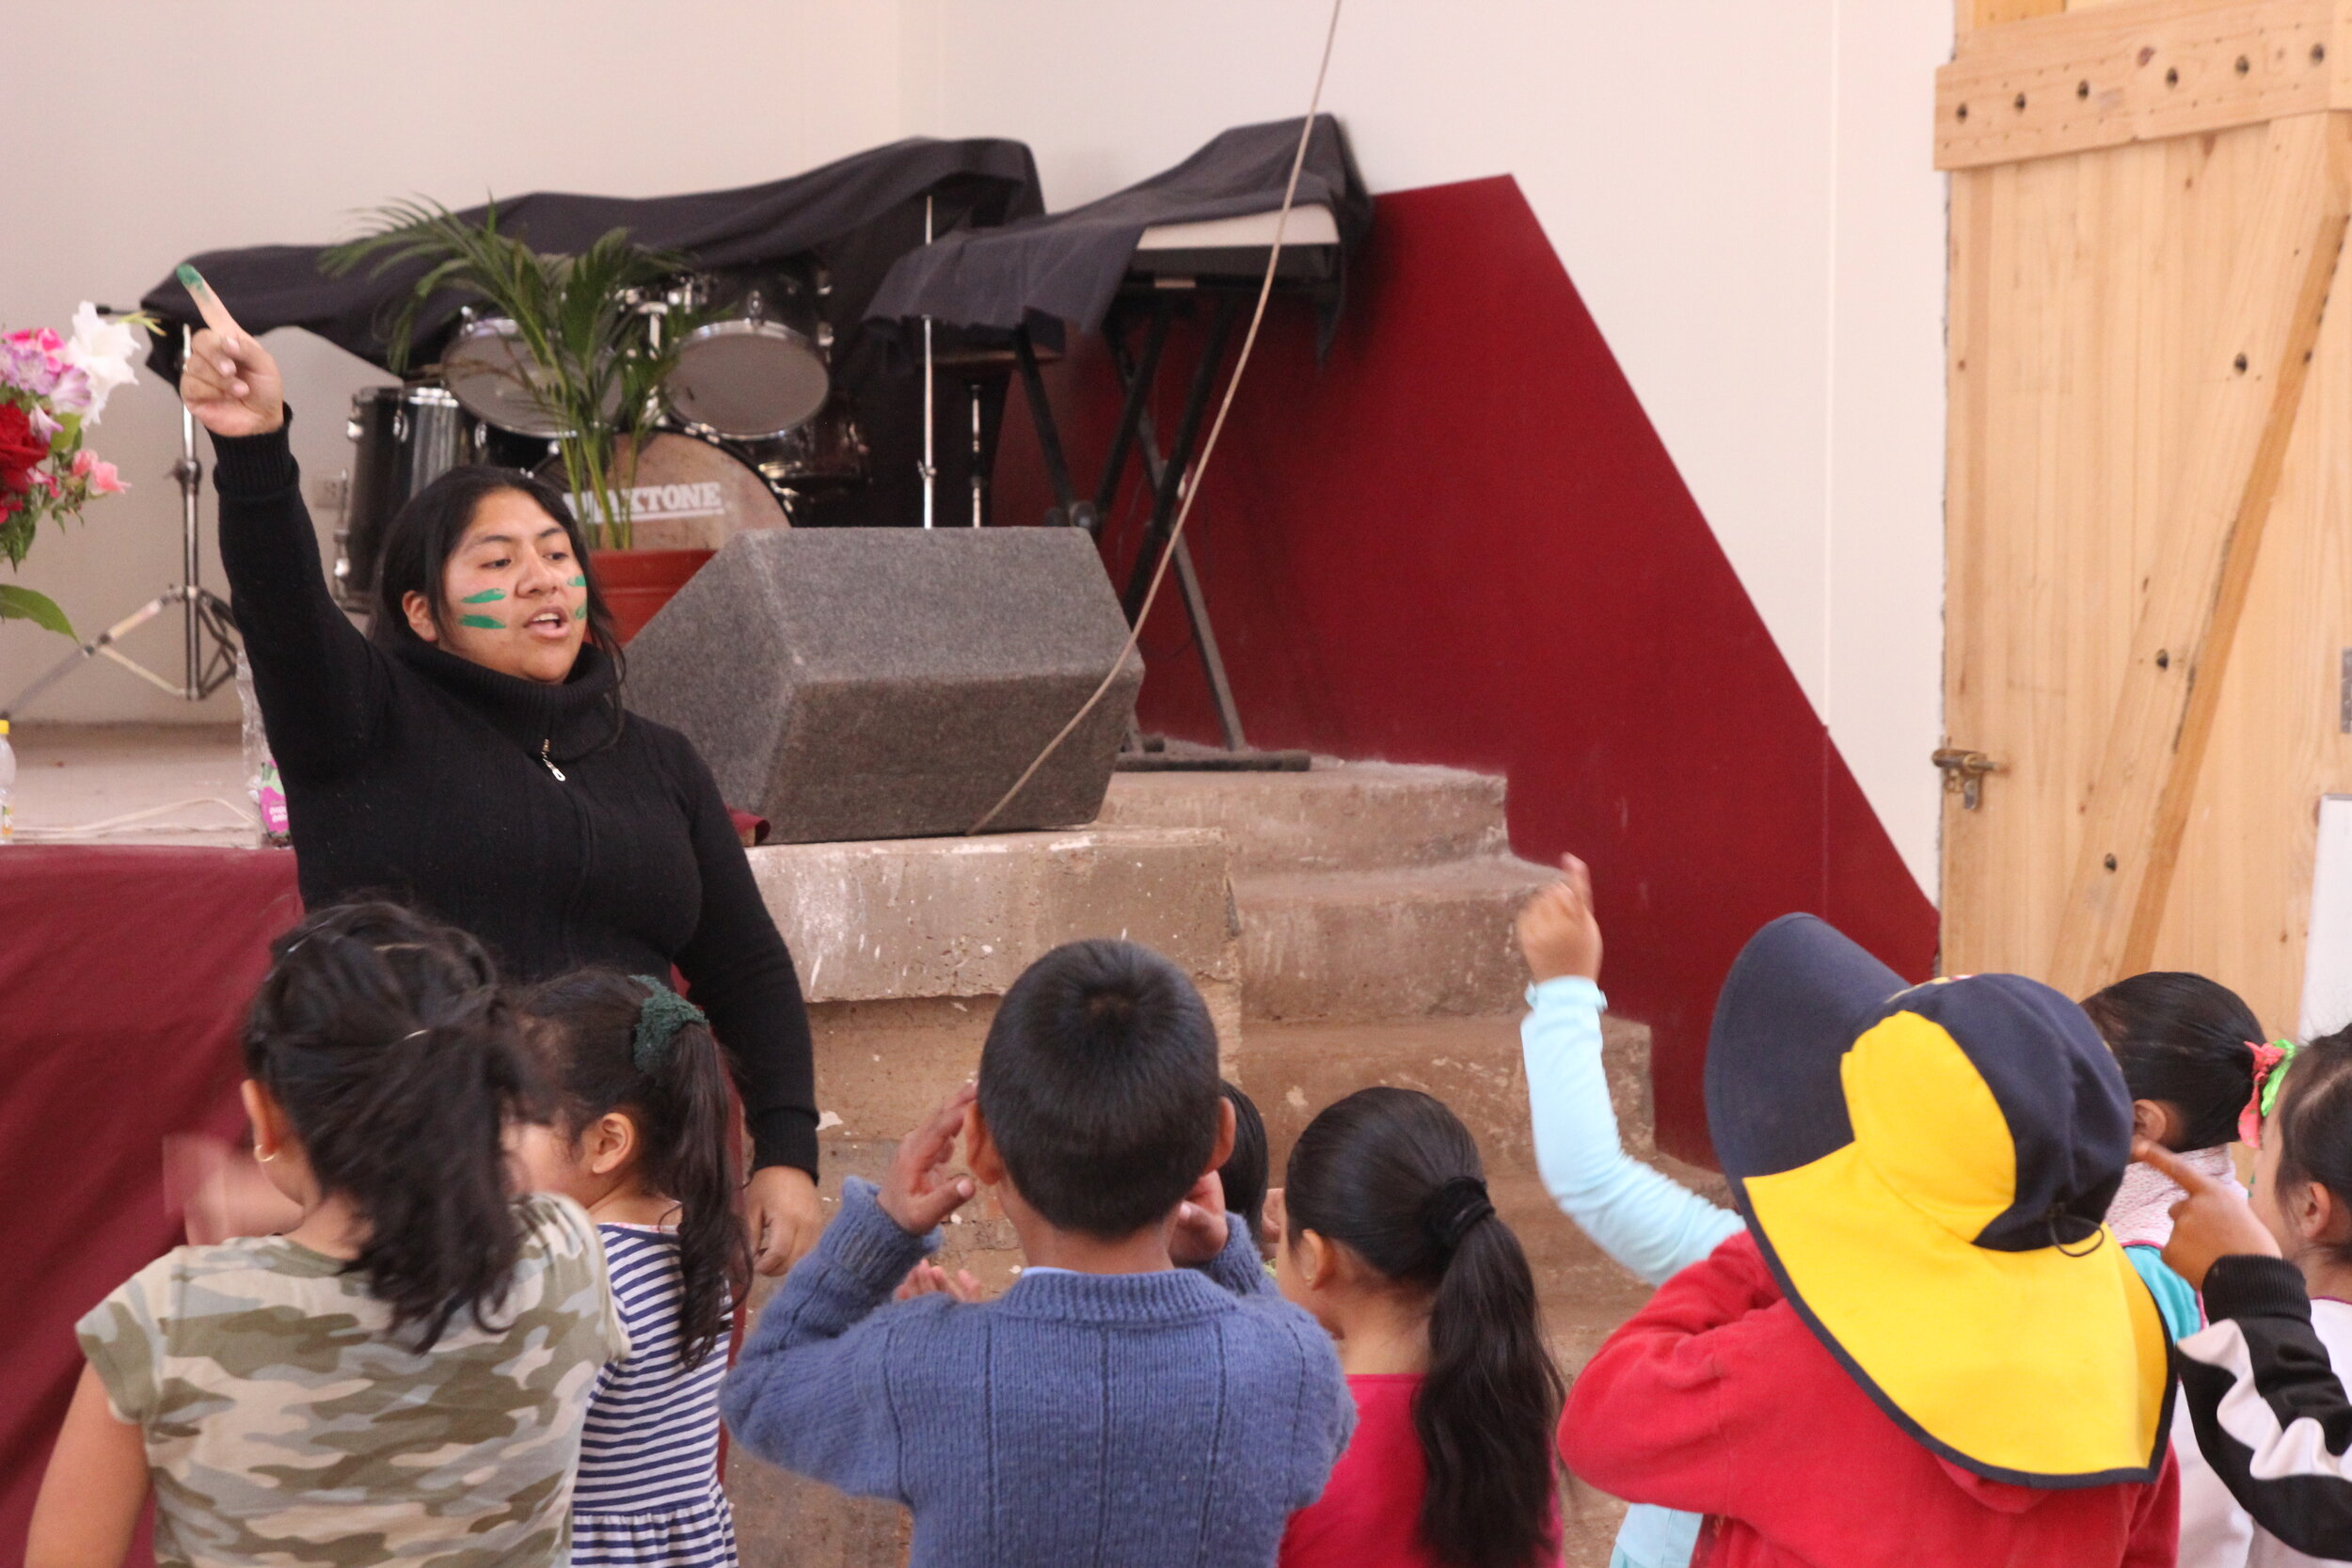 Vacation Bible School at La Iglesias Presbyteriana Jesus El Buen Pastor (Jesus the Good Shepherd Presbyterian Church)